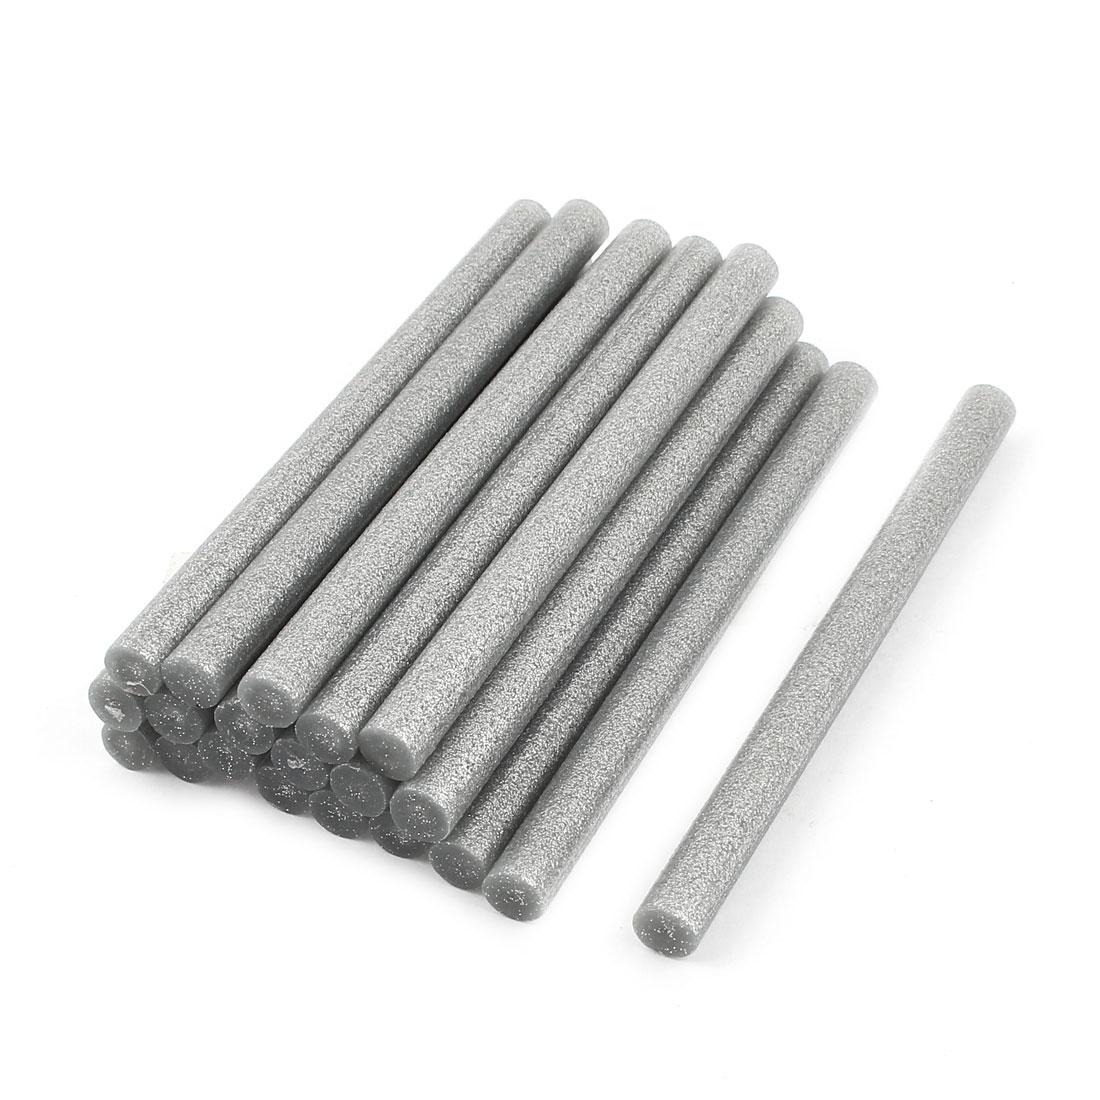 20 Pcs 11mm Diameter 150mm Length Crafting Model Silver Tone Hot Melt Glue Stick